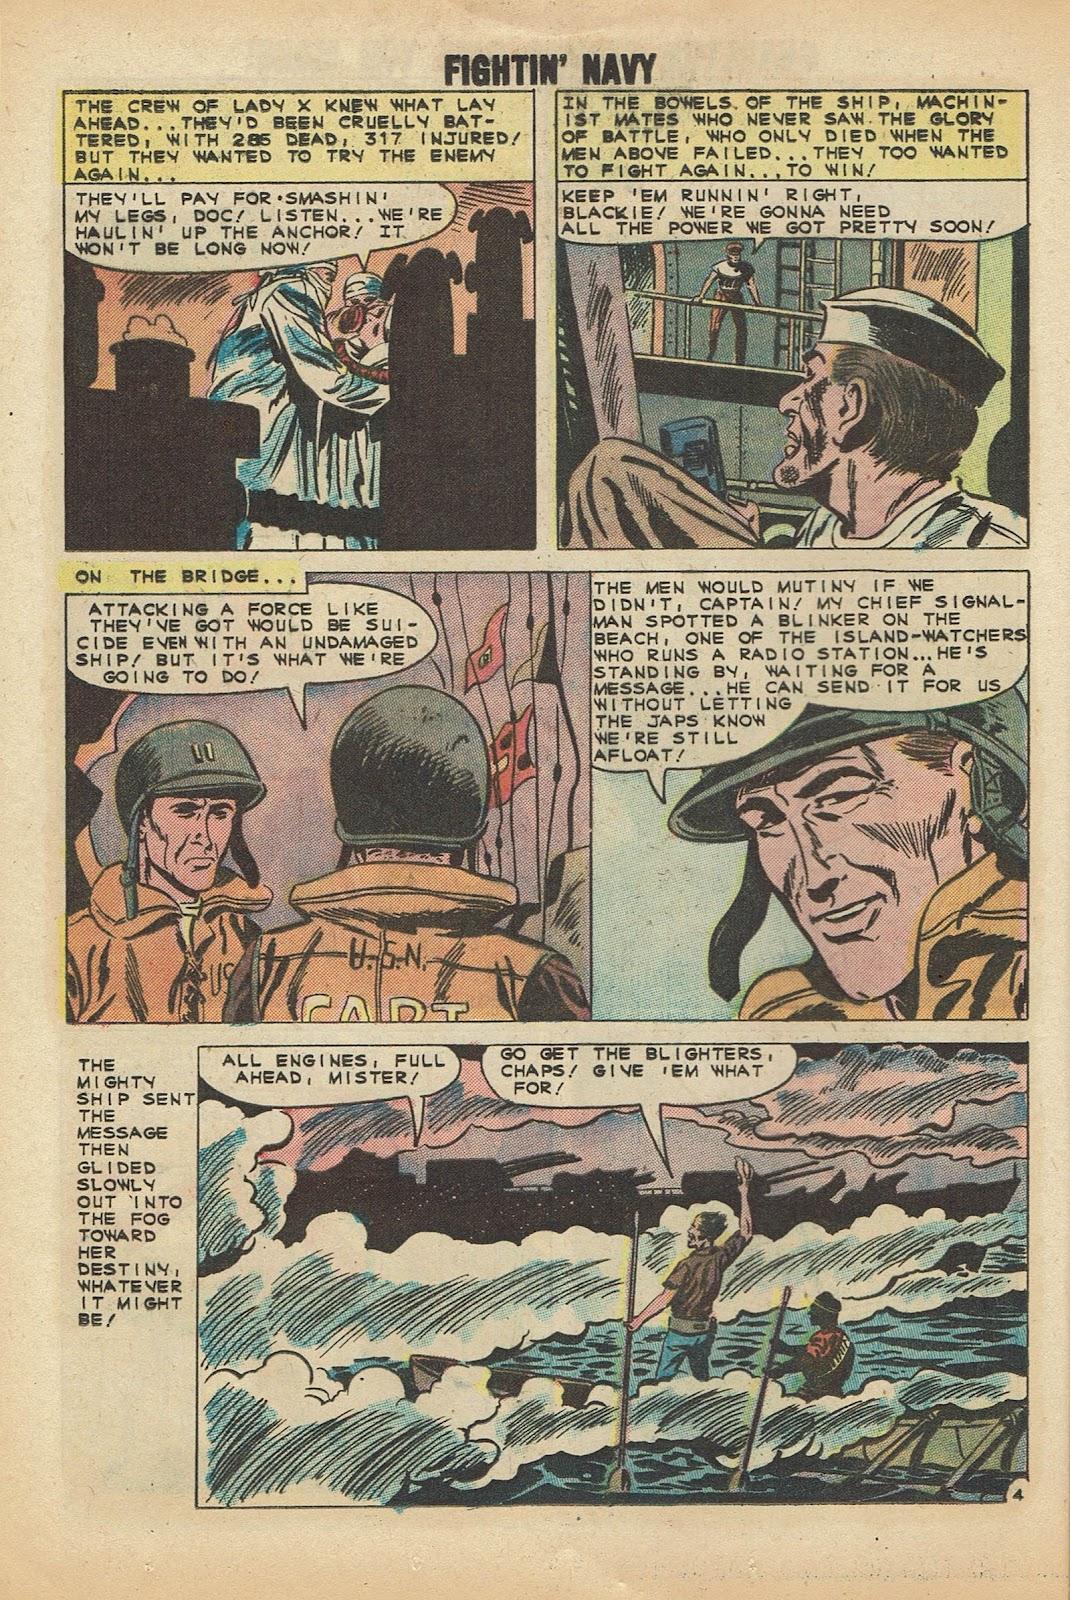 Read online Fightin' Navy comic -  Issue #97 - 12